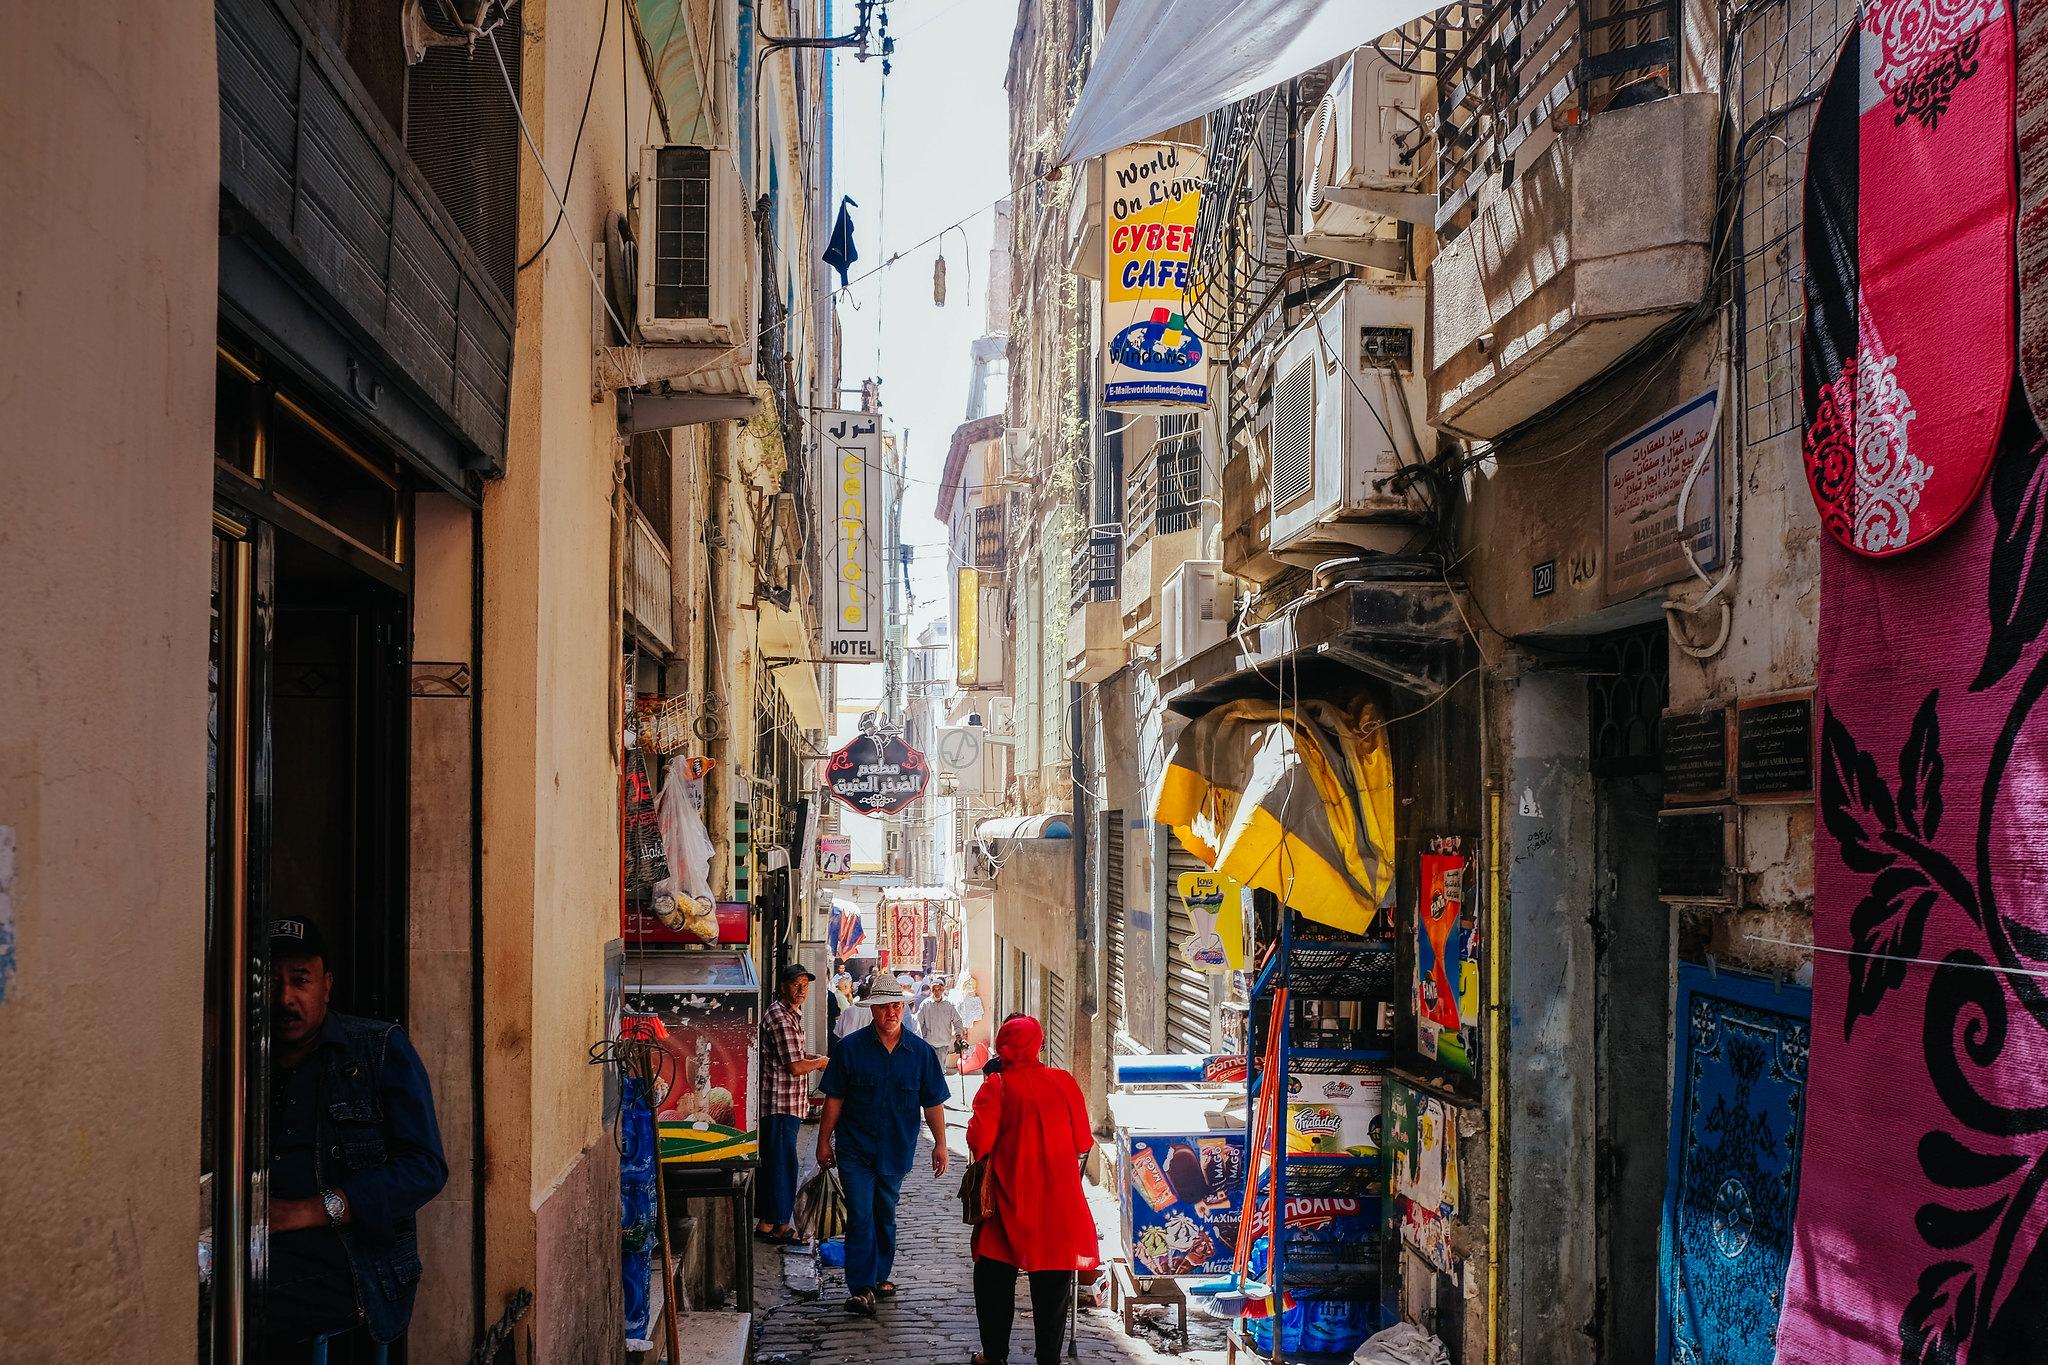 Streets of Constantine